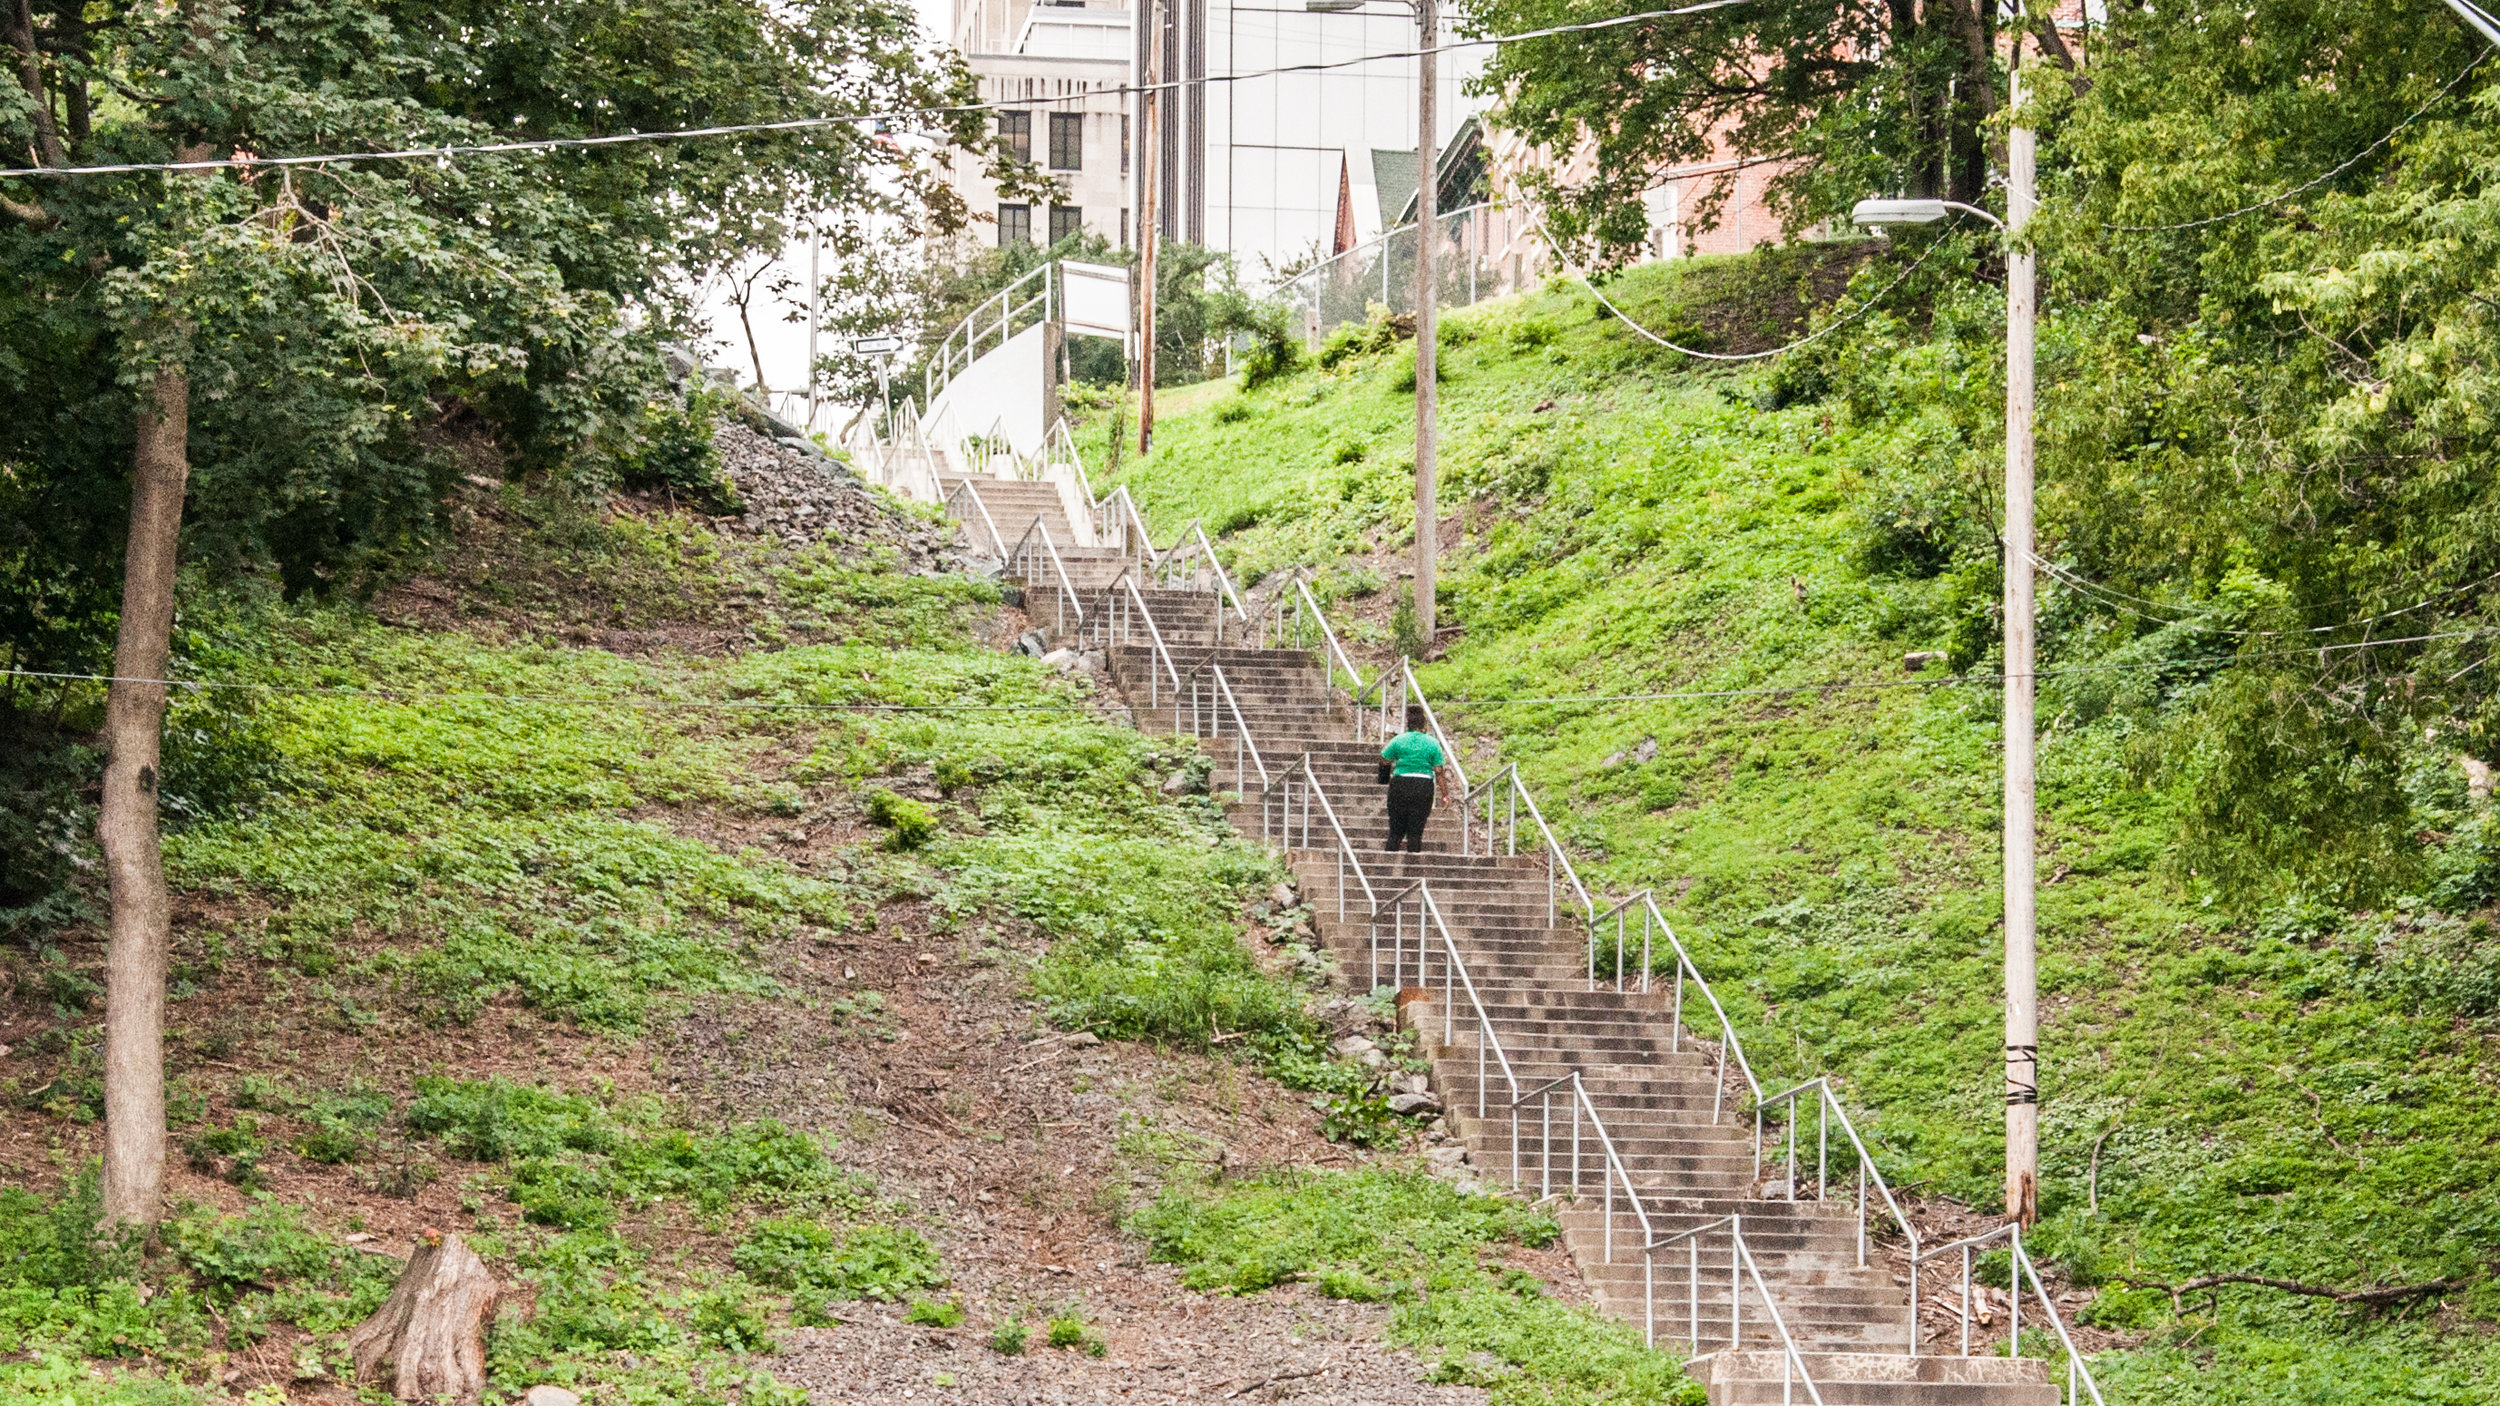 SwainSt_Stairs_Existing.jpg